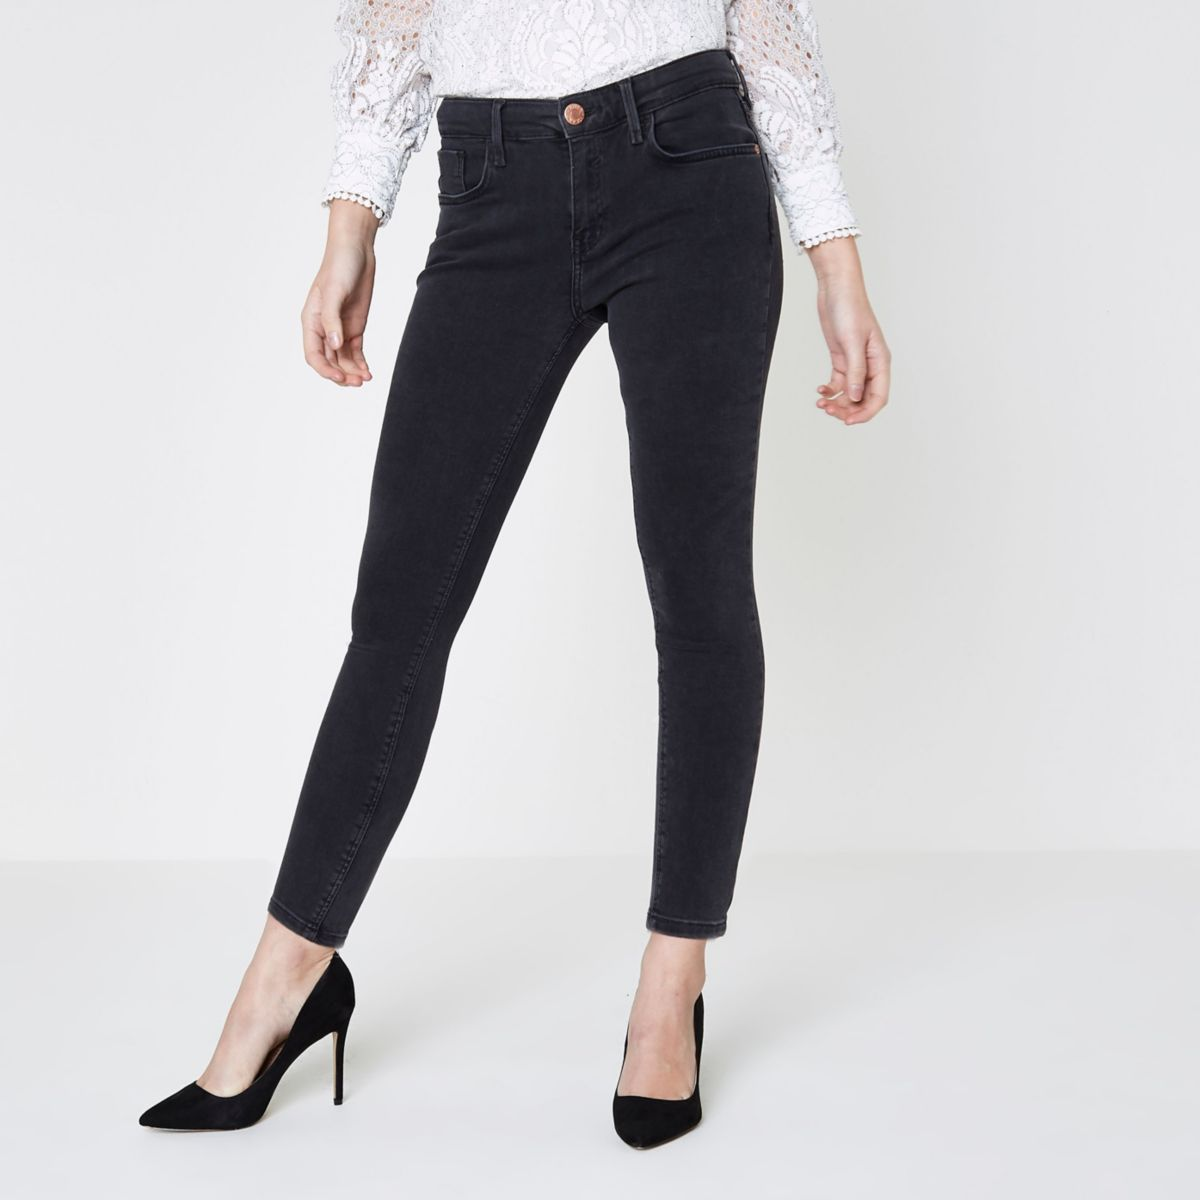 RI Petite - Amelie - Zwarte washed superskinny jeans